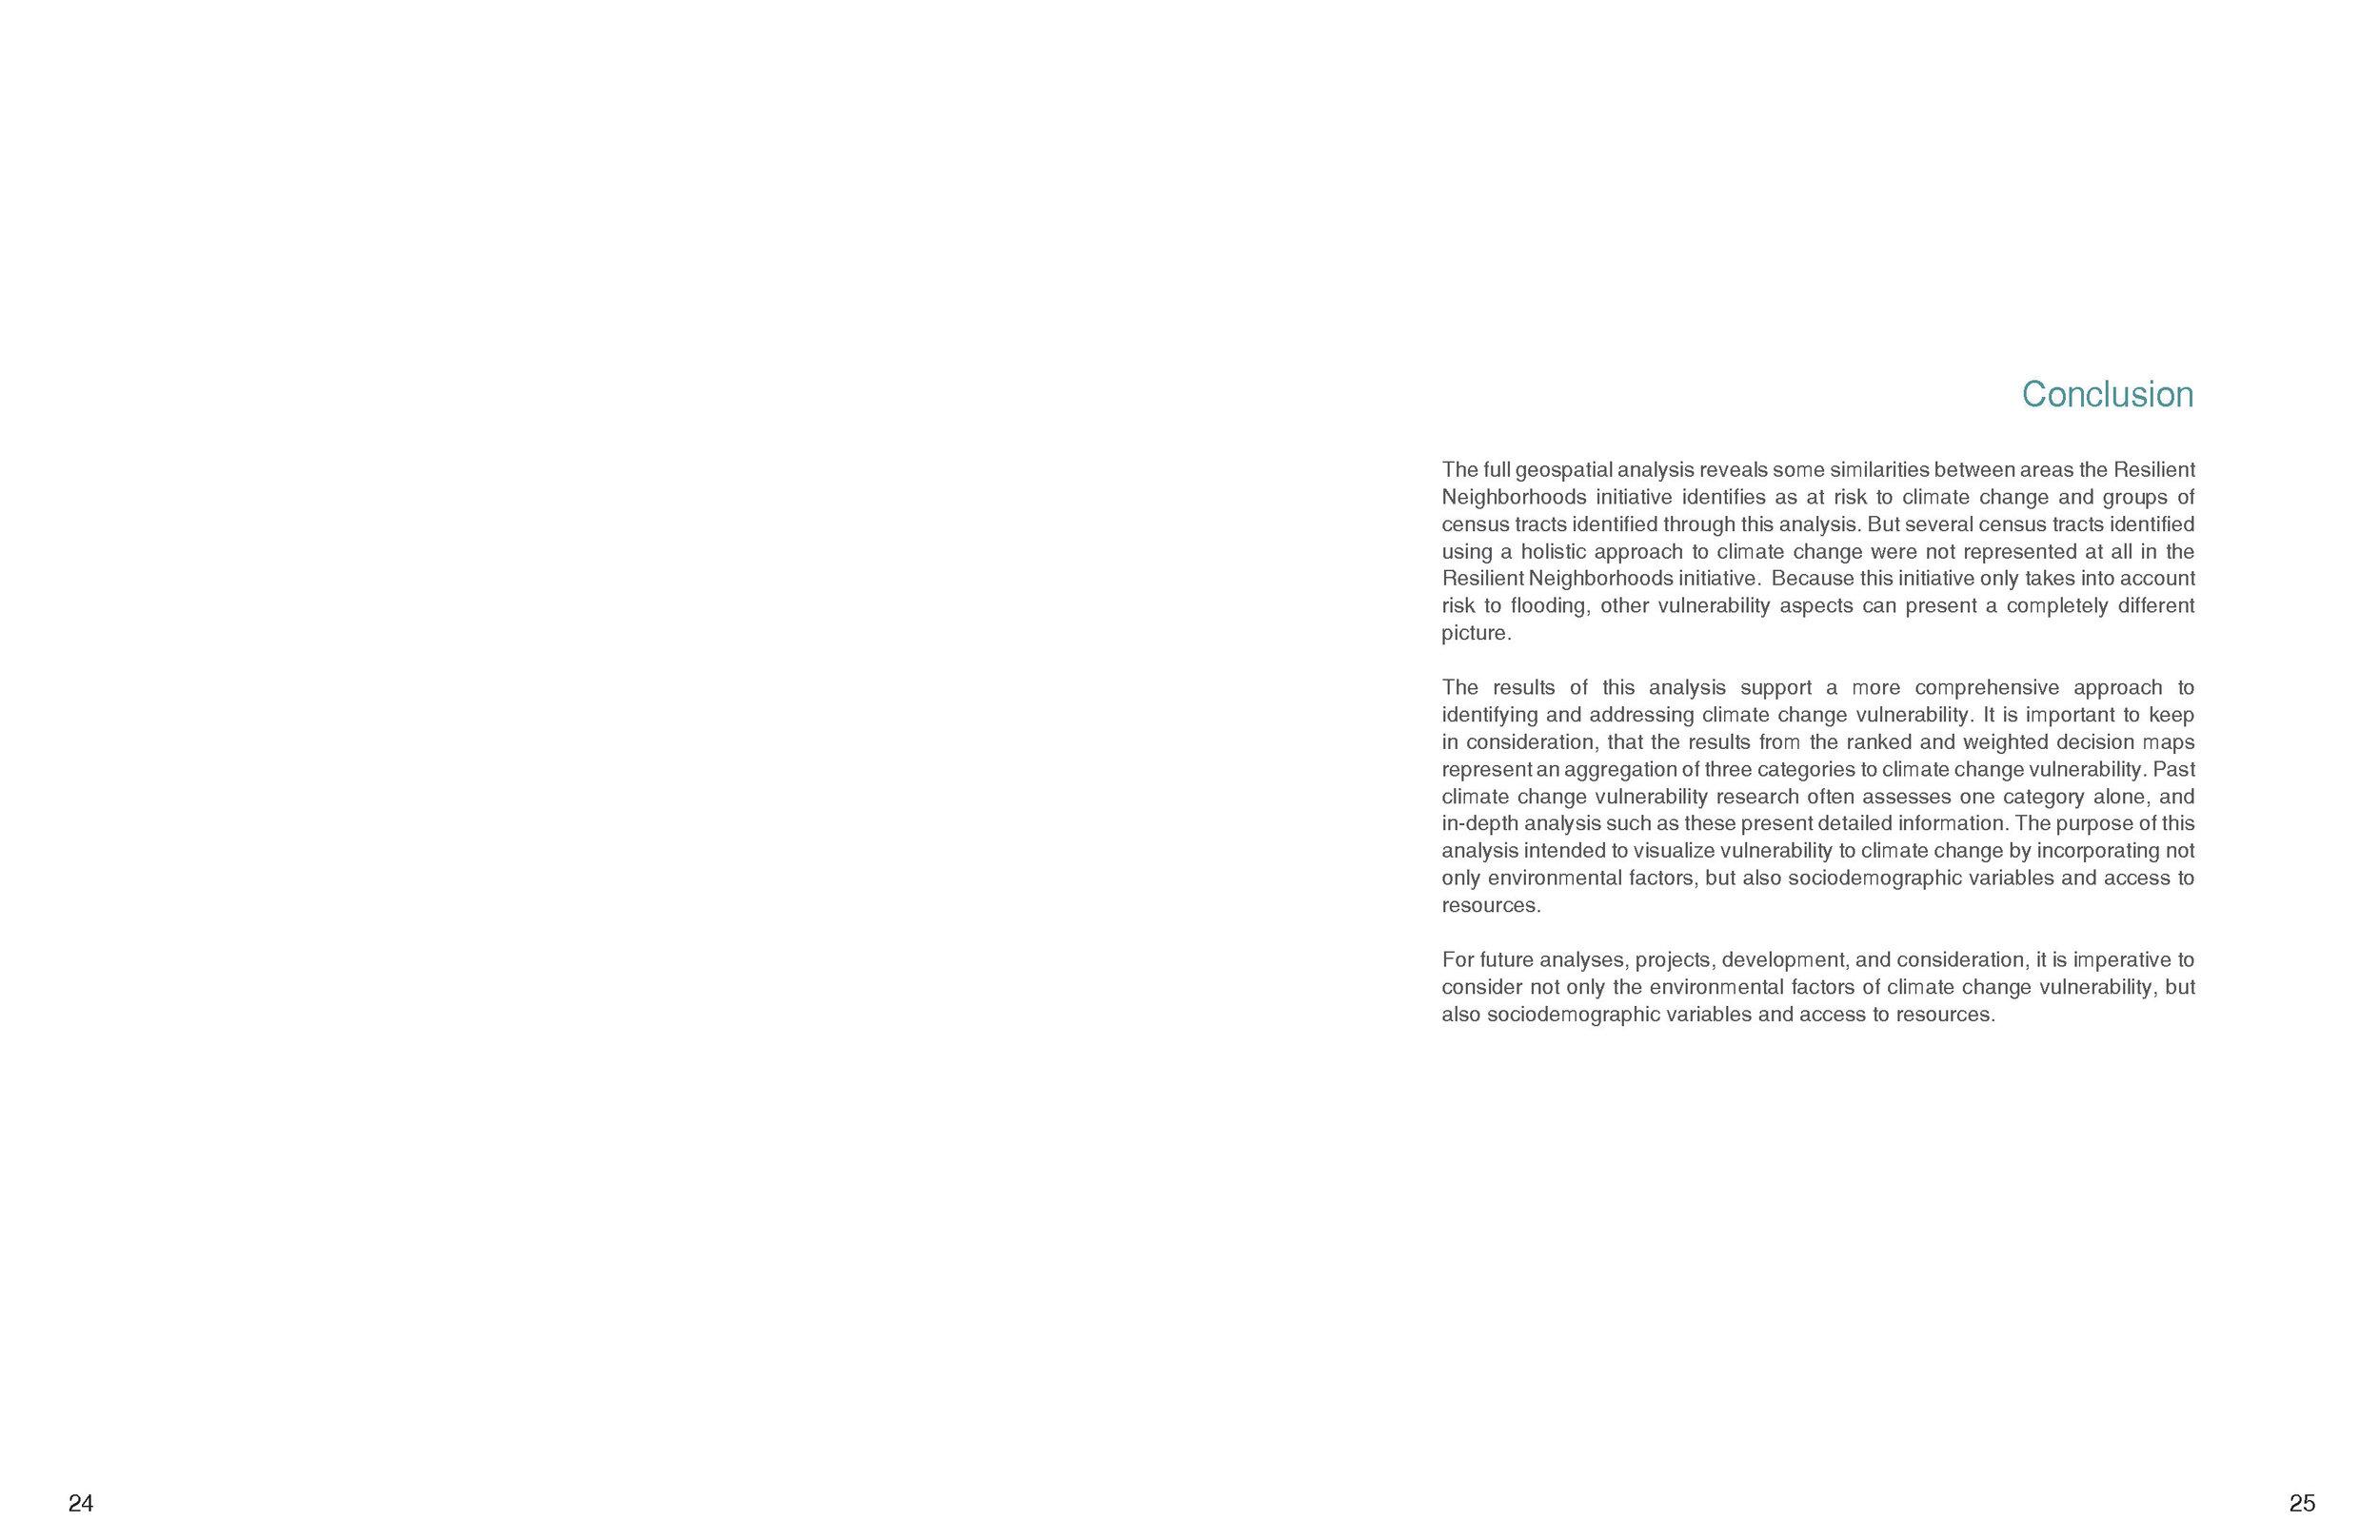 ClimateChangeVulnerability_P28-29.jpg